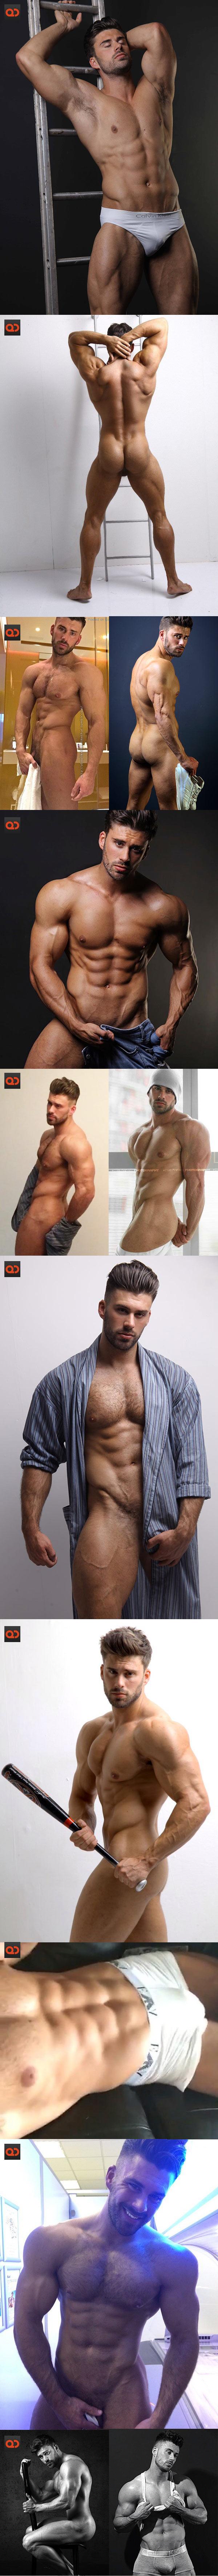 Liam Jolley, Fitness Model And Instagram Star, Alleged Skype Jerk Off Leaks!